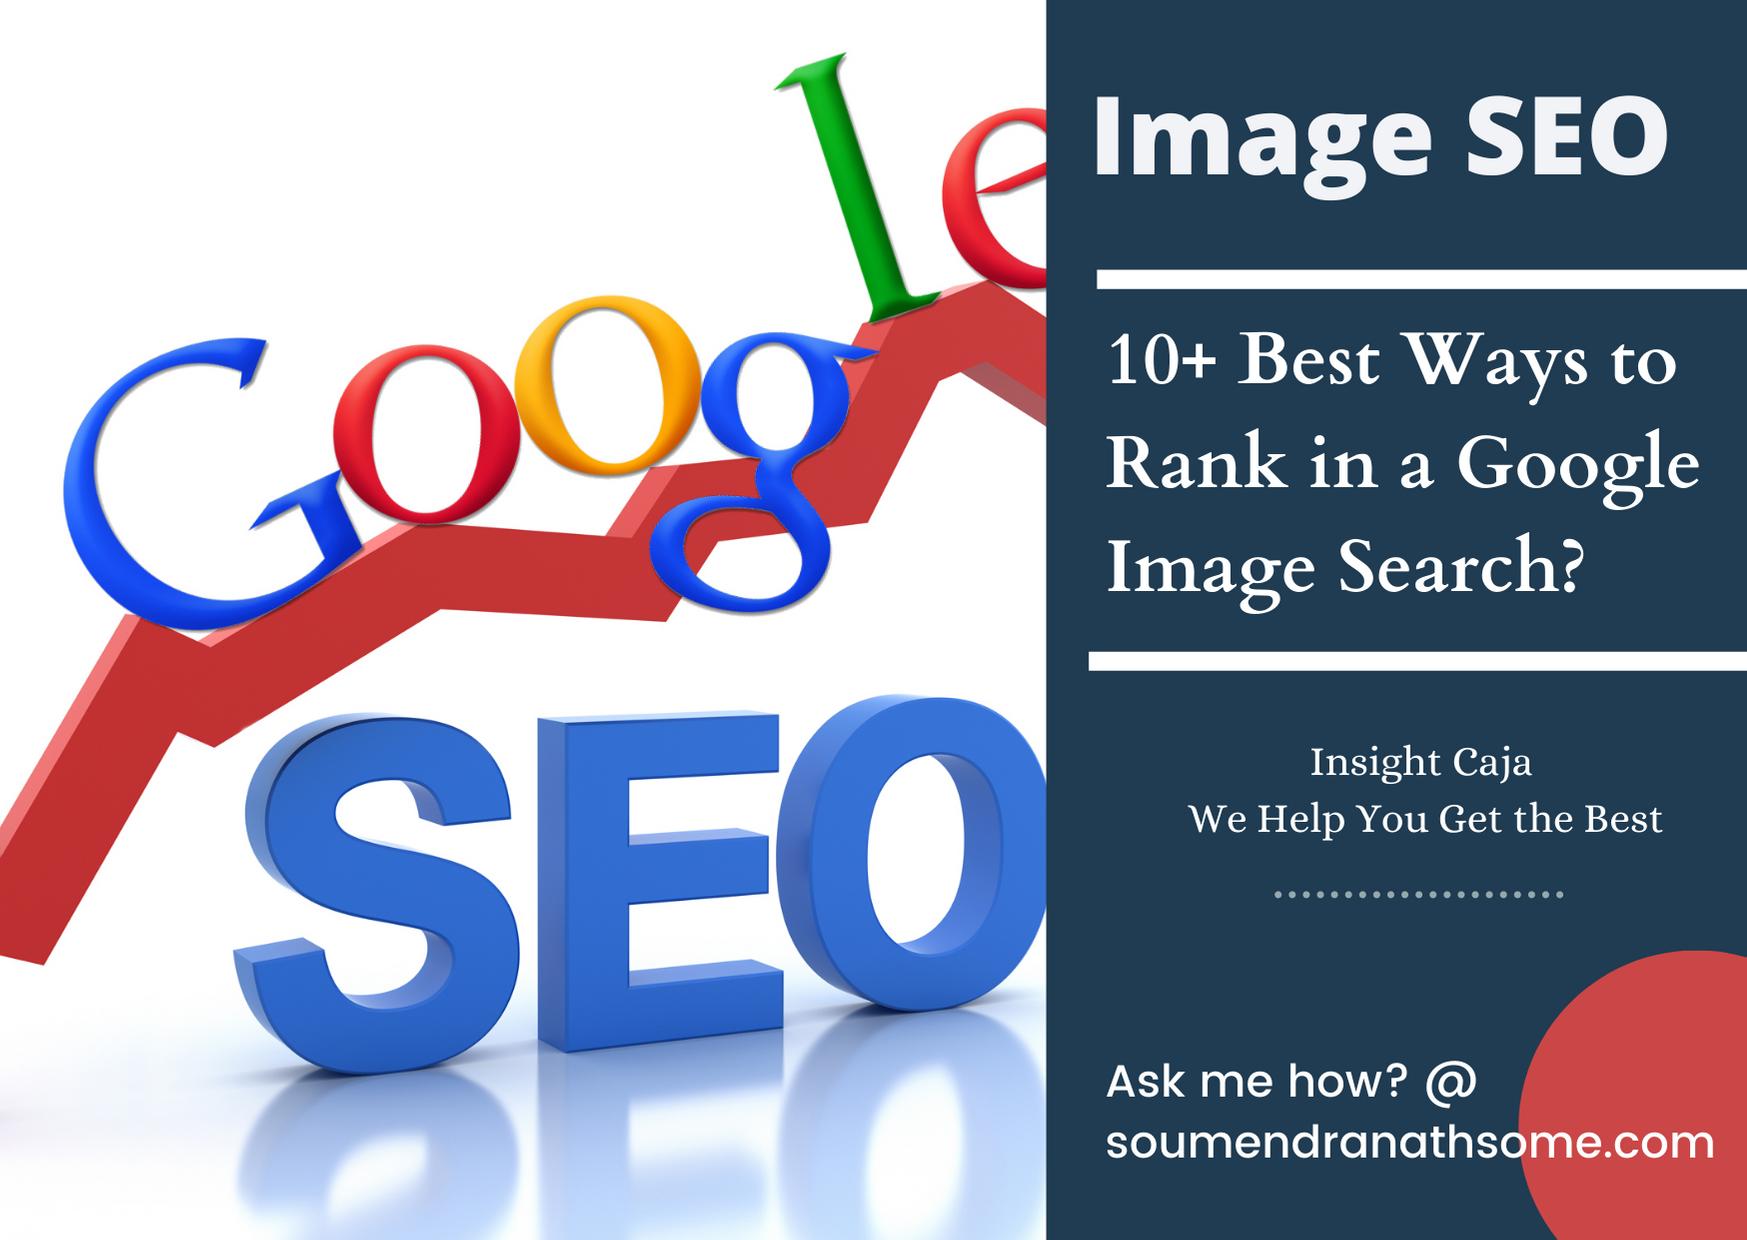 image-seo-google-insight-caja-insights-for-life